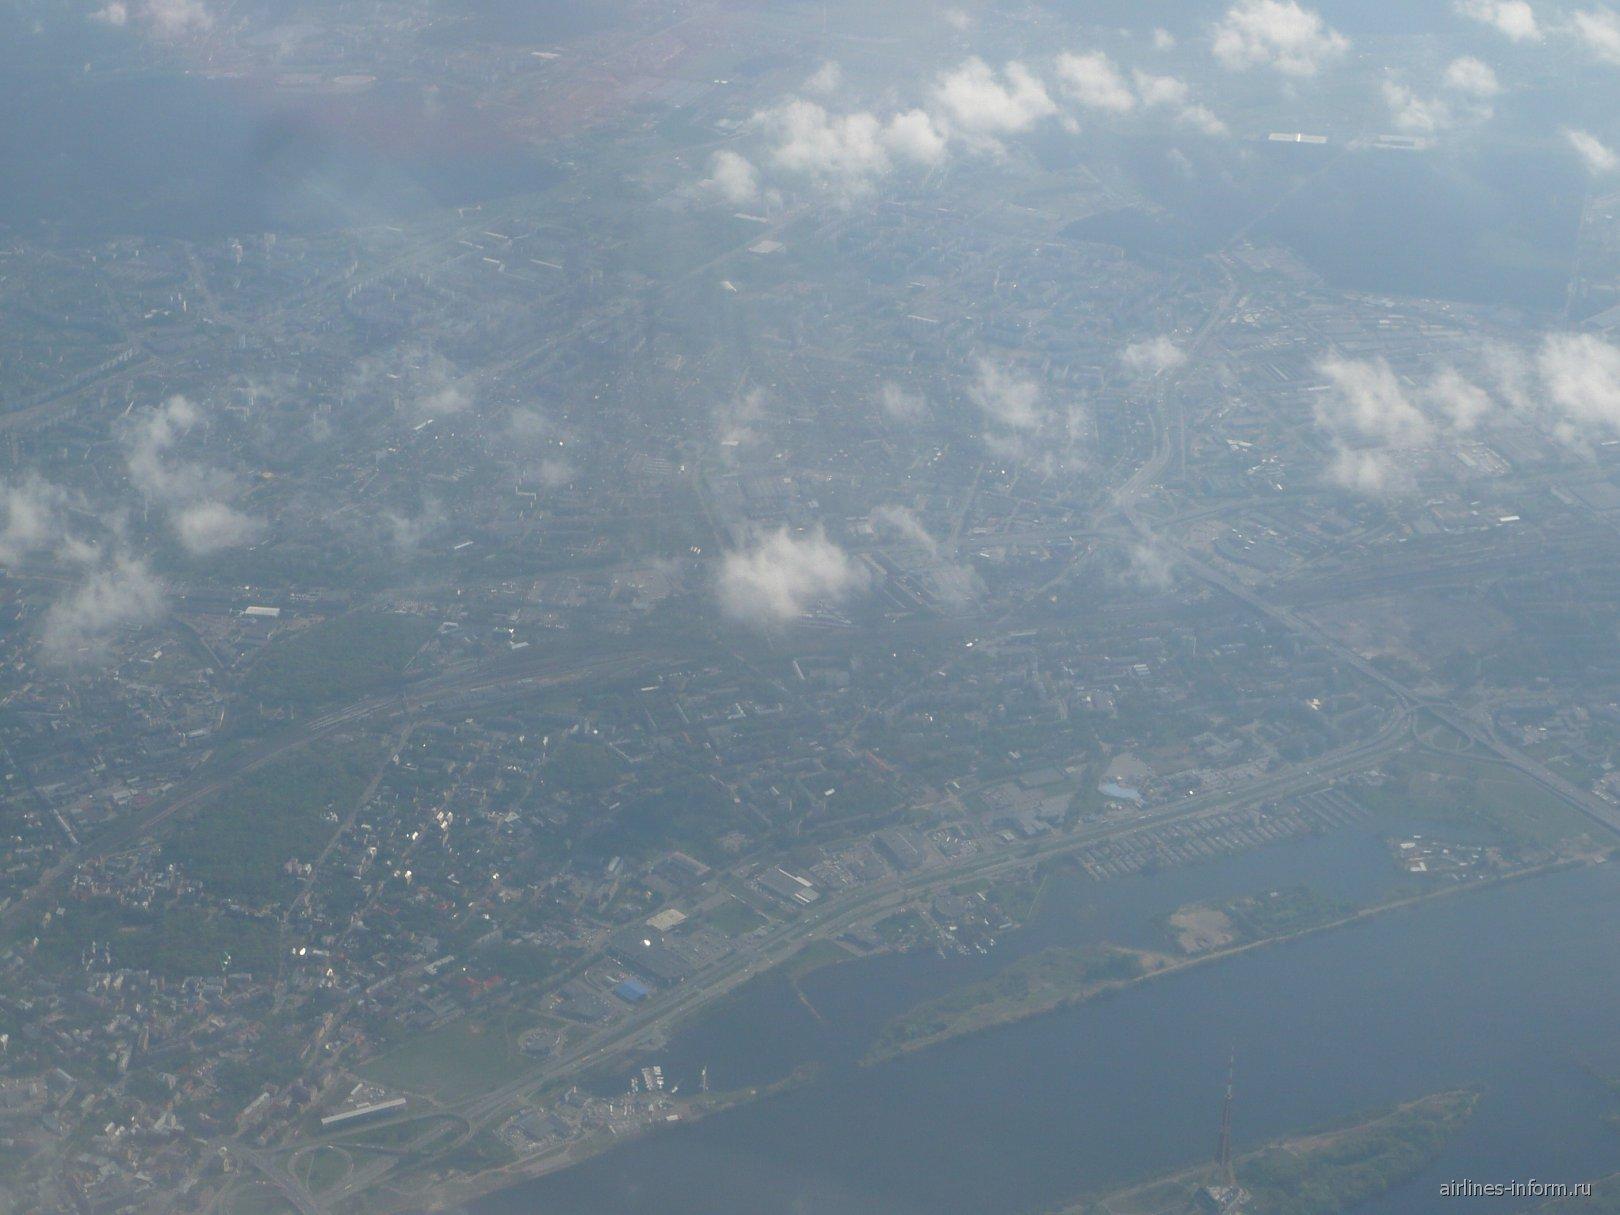 Рейс Рига-Хельсинки авиакомпании airBaltic